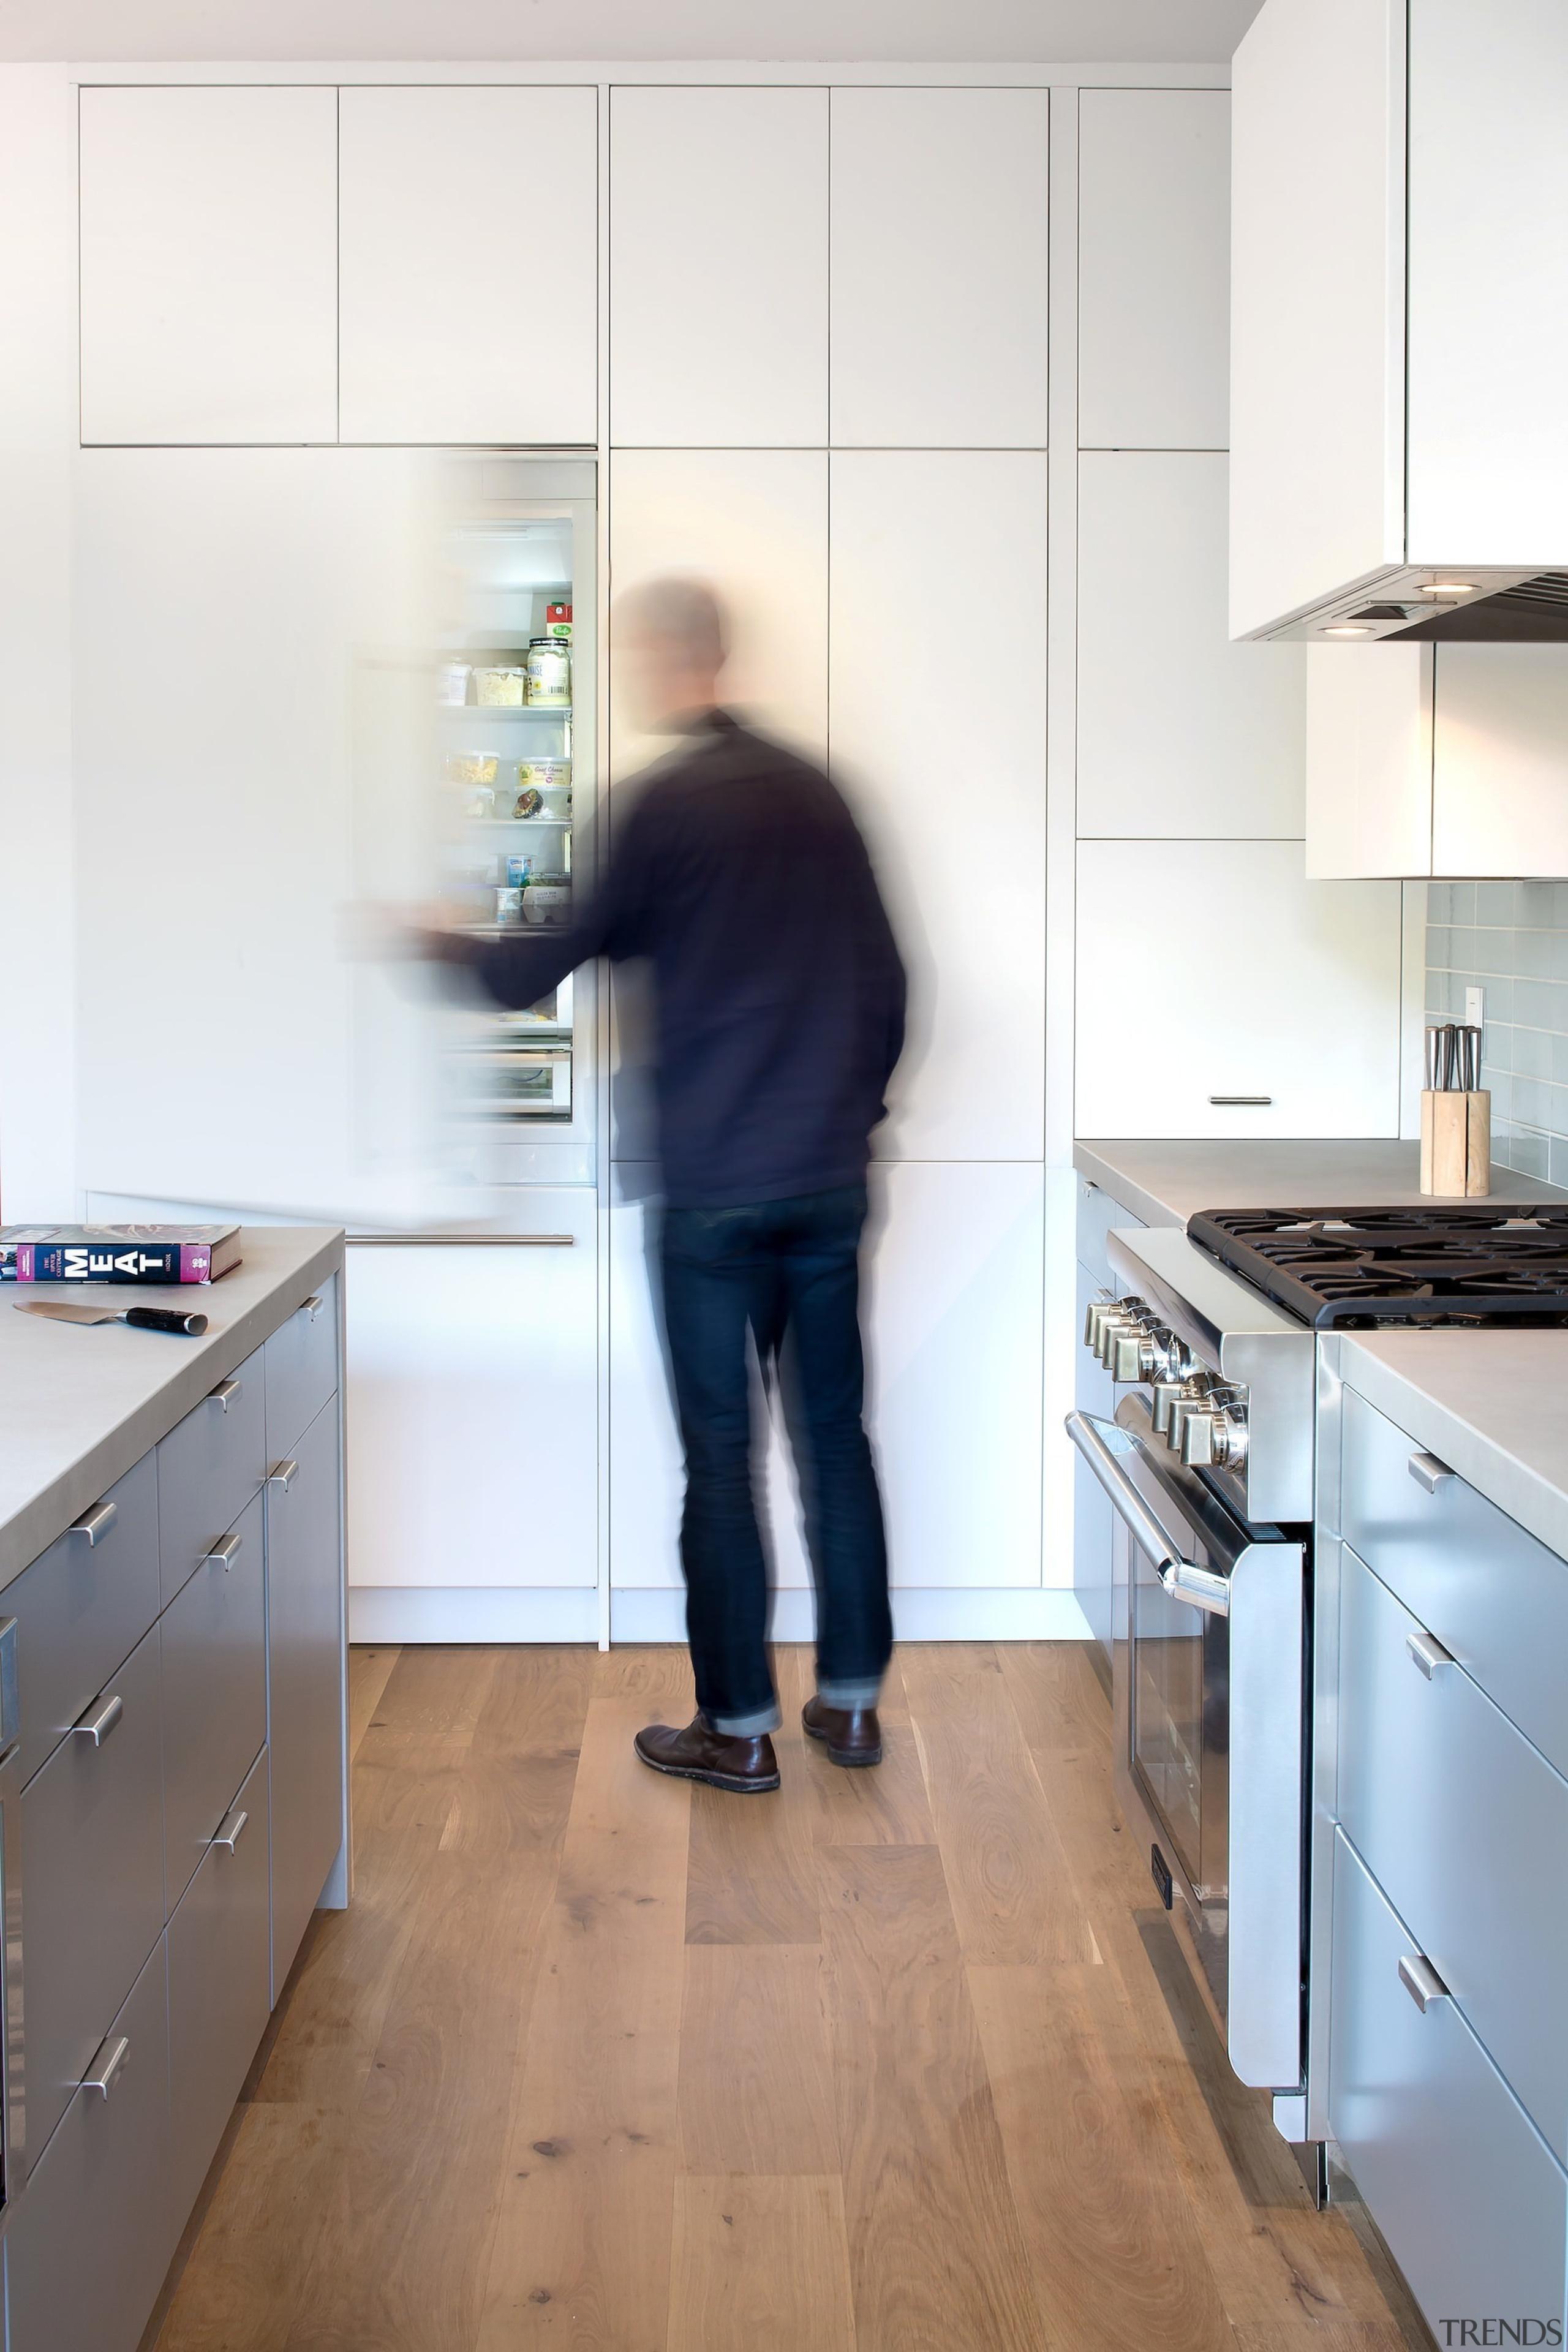 A large kitchen features plenty of storage - countertop, floor, flooring, furniture, home appliance, house, interior design, kitchen, room, wood, white